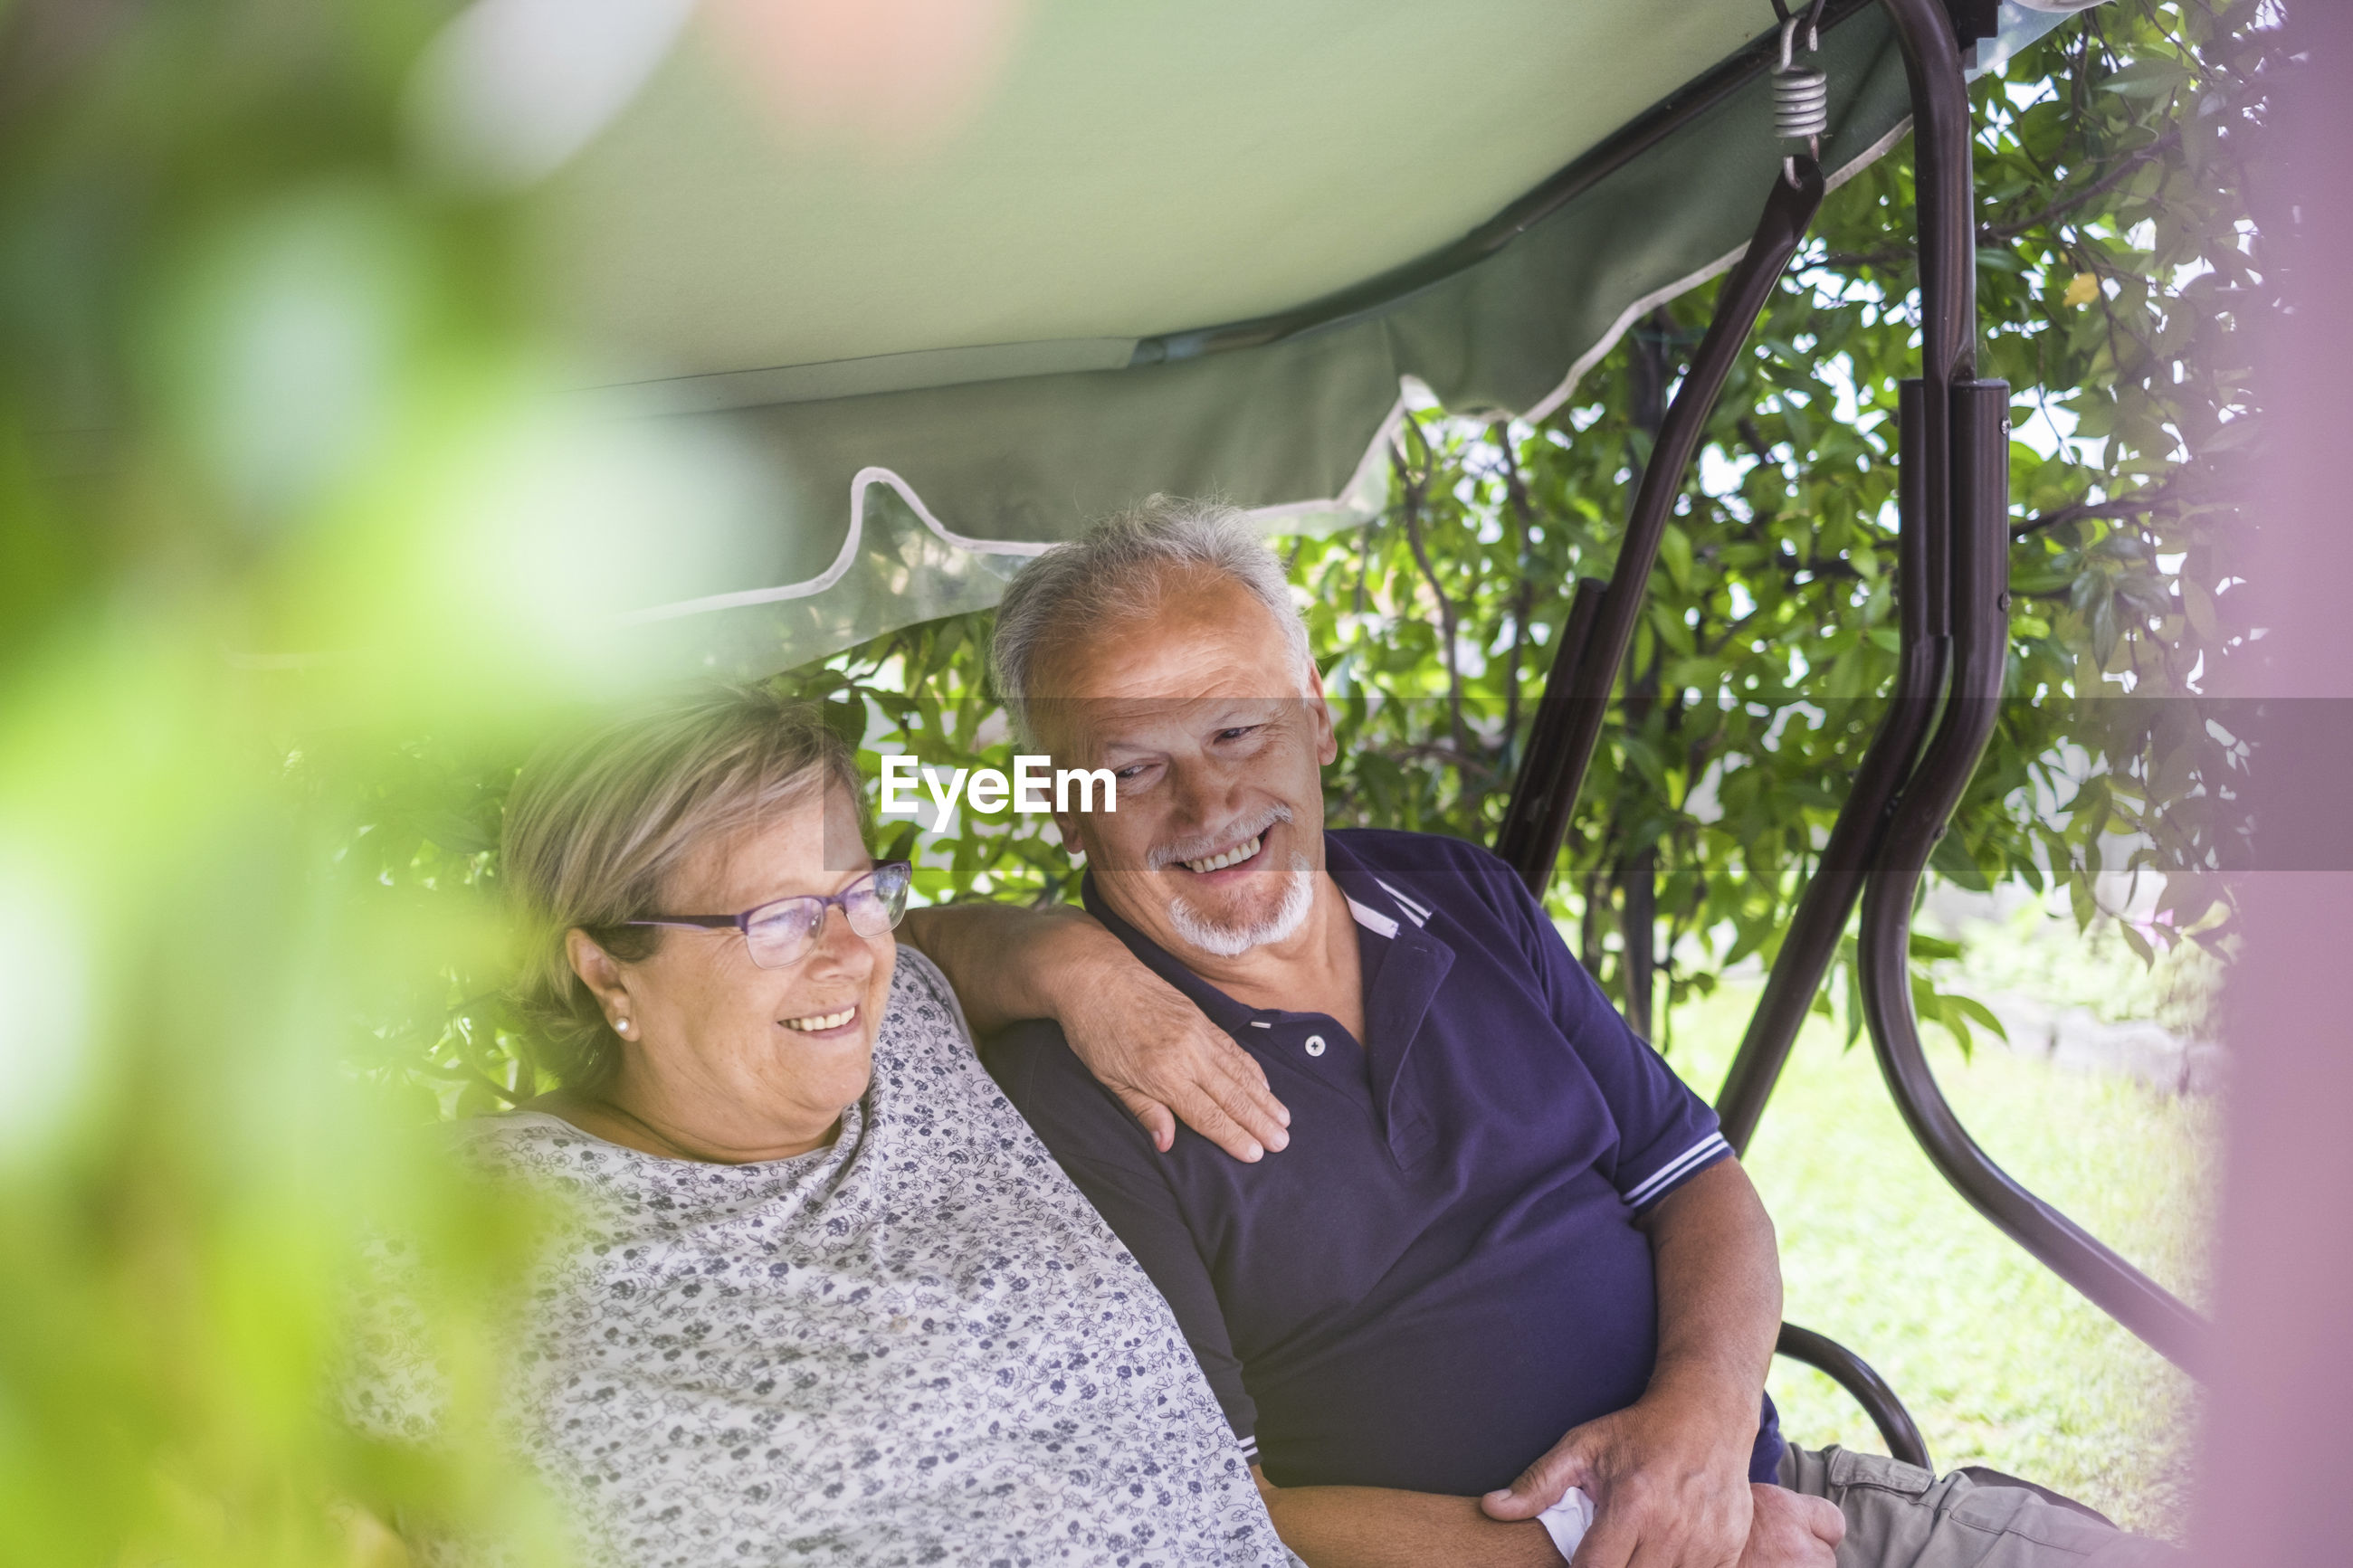 Smiling senior couple sitting on seat